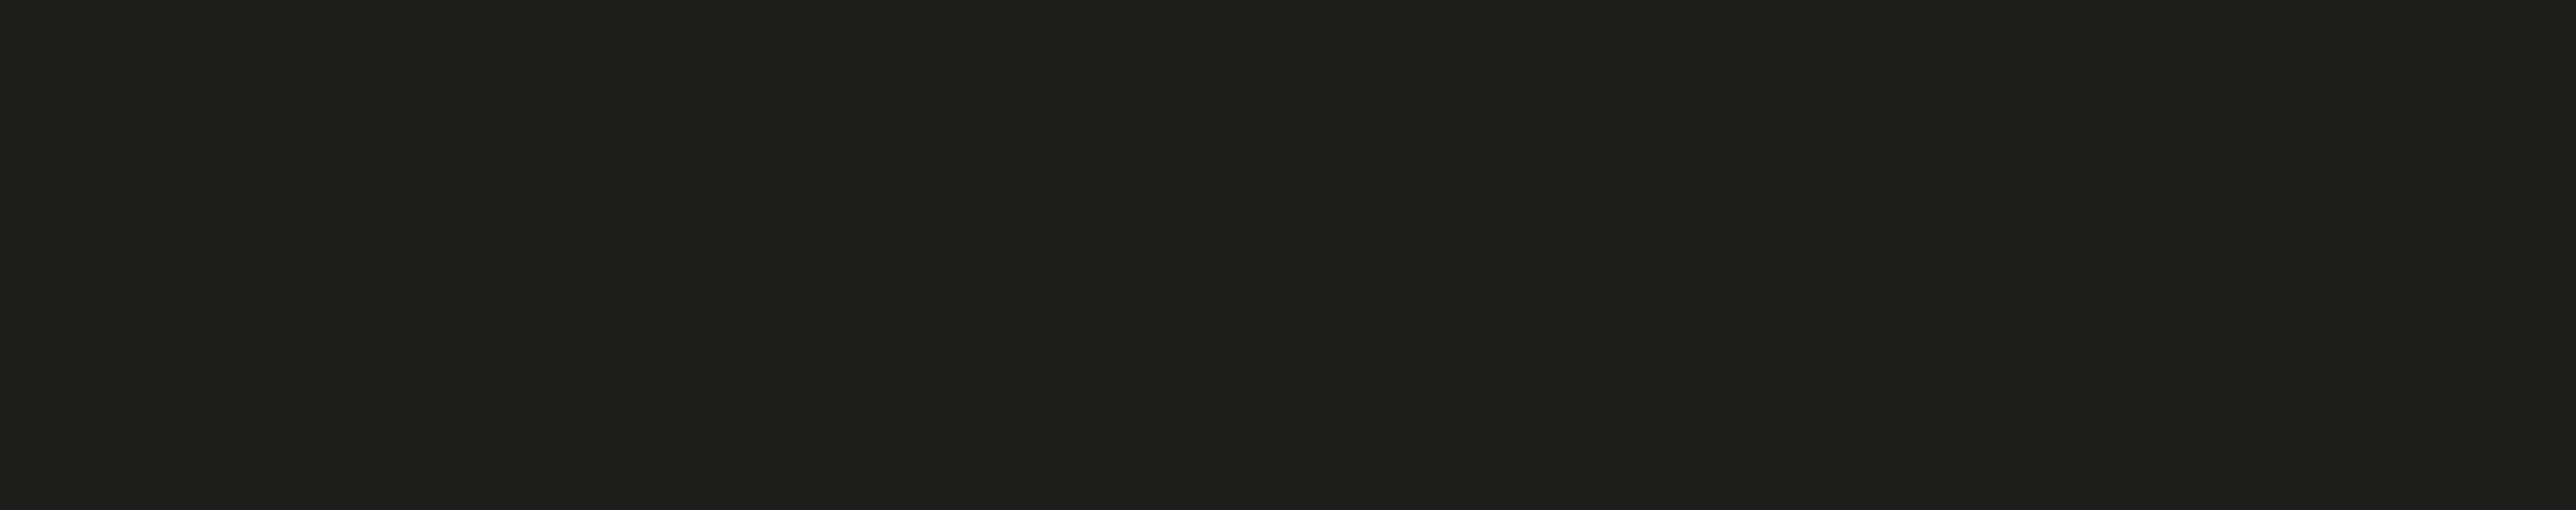 Dashing-Dogs_logo_special